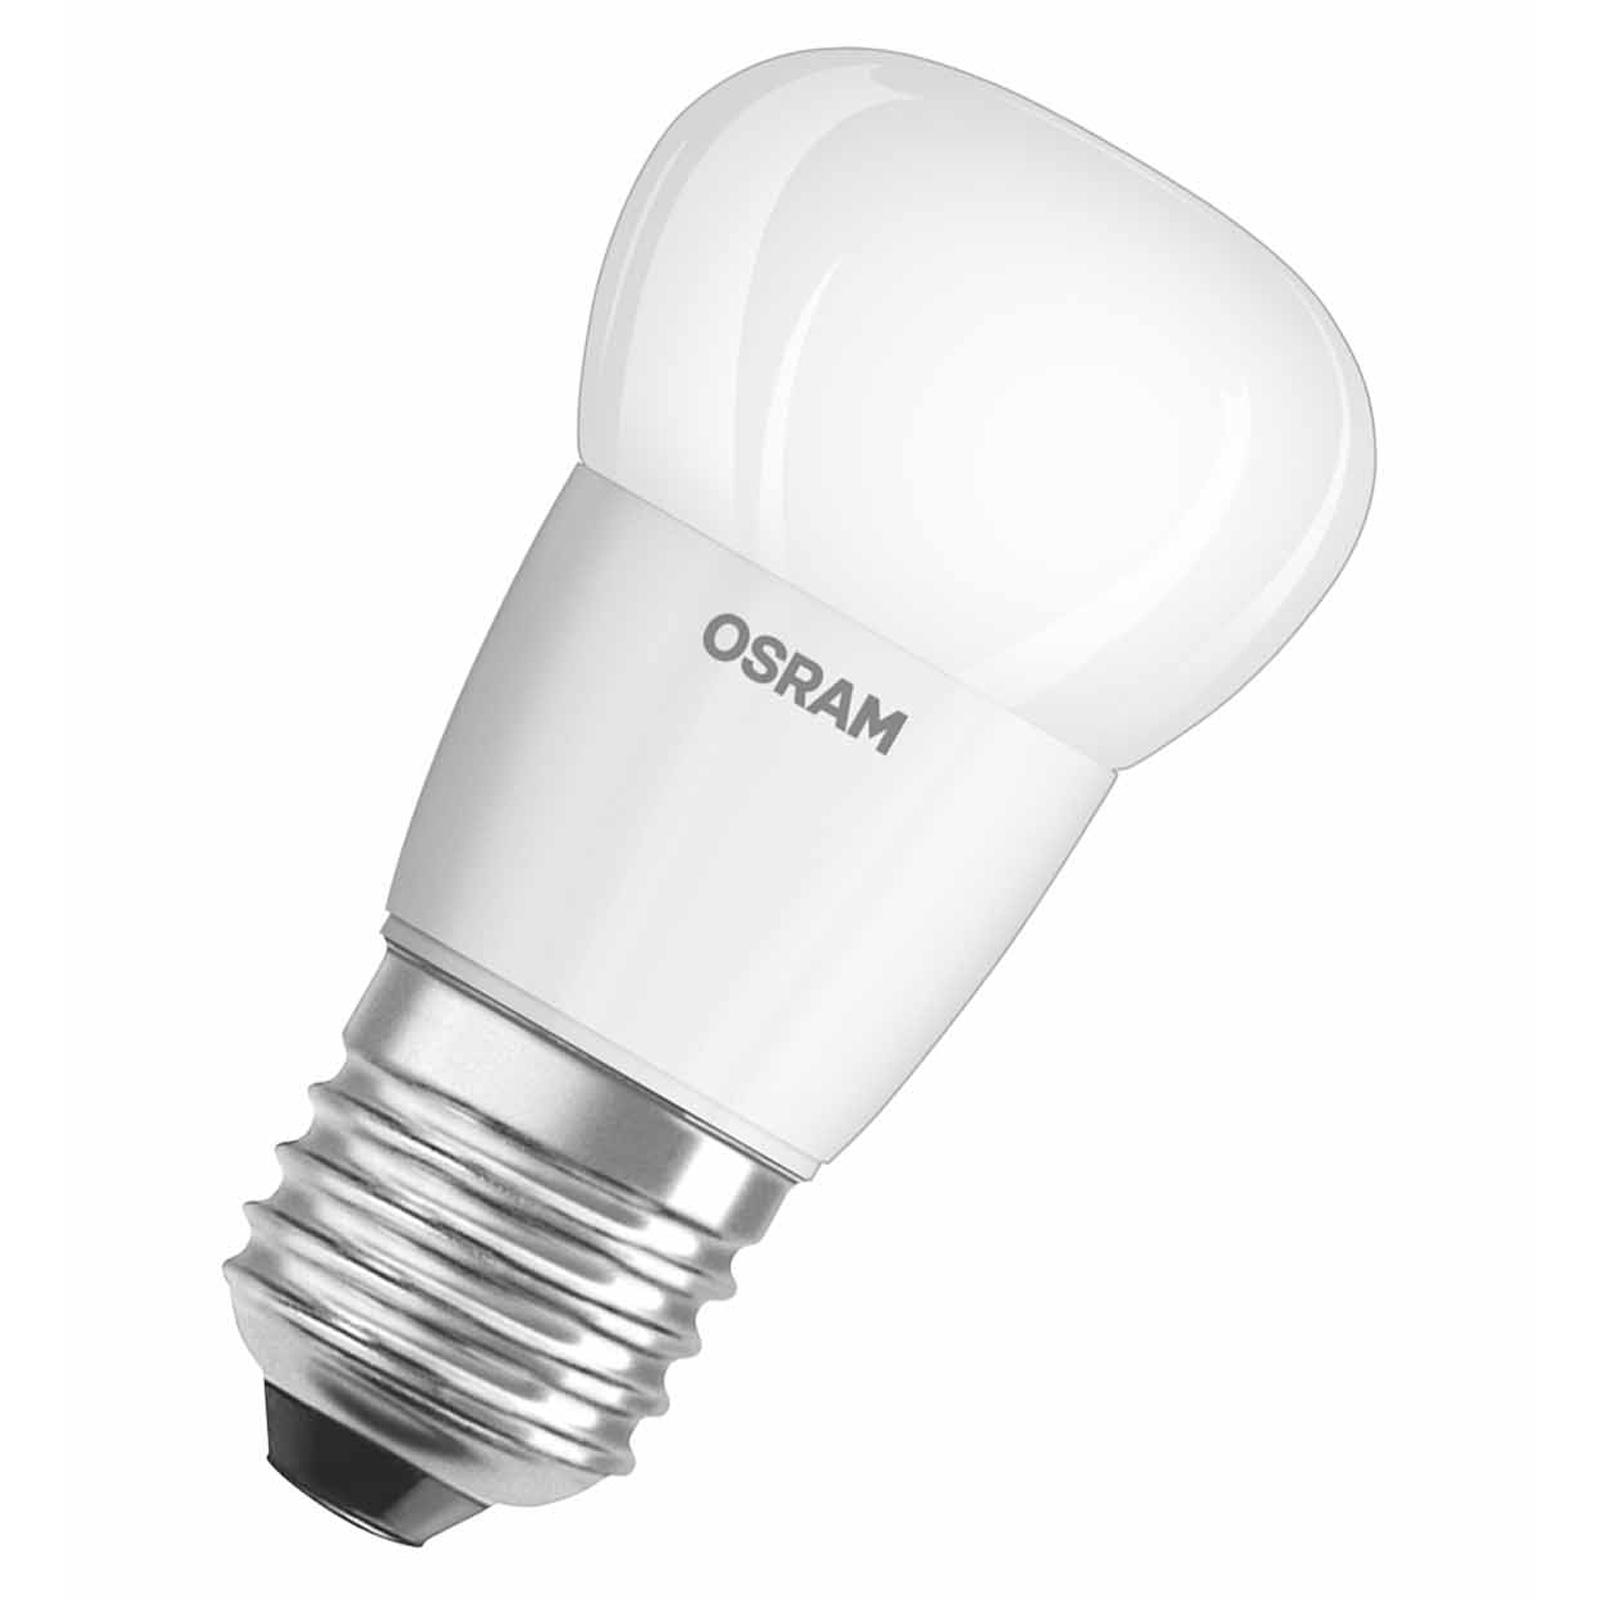 osram led star classic p 40 e27 5 8 watt ersatz f r 40 watt 470 lumen warmwei ebay. Black Bedroom Furniture Sets. Home Design Ideas